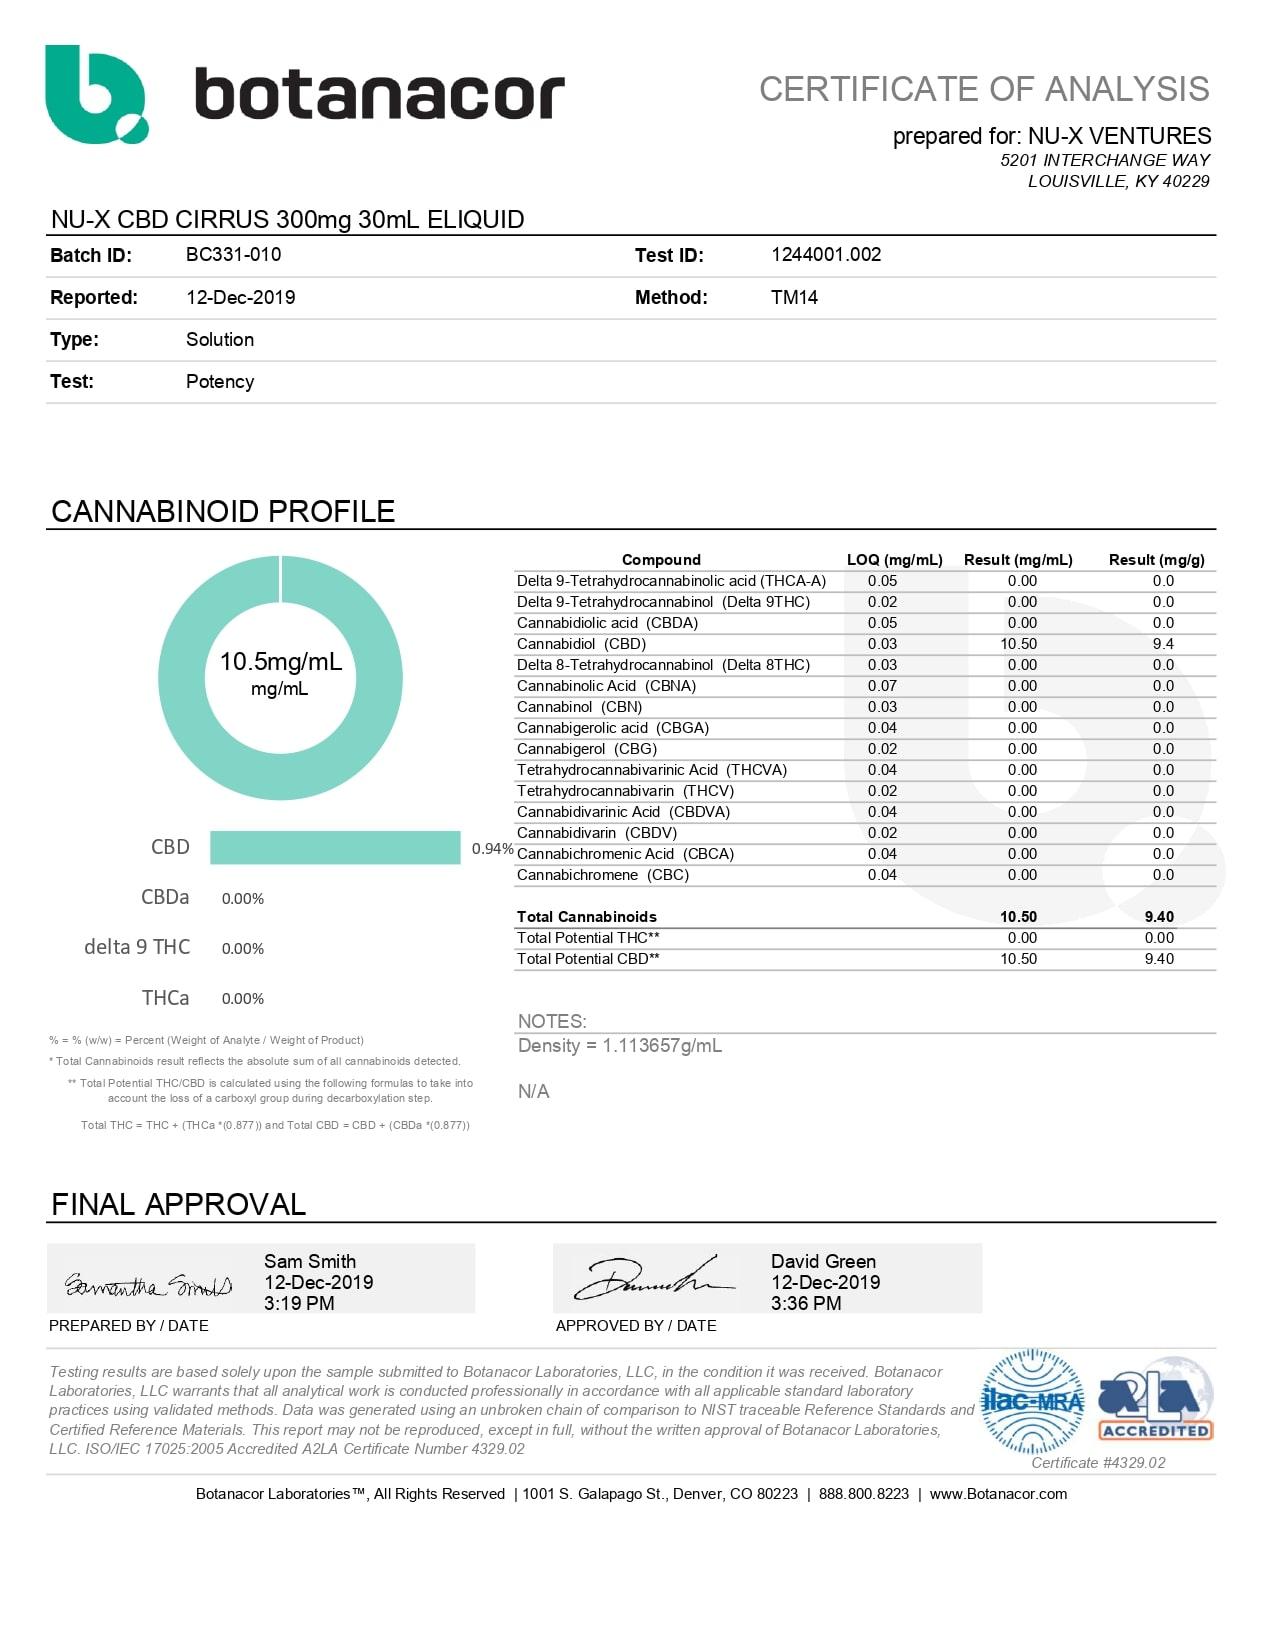 NU-X CBD eLiquid Strawberry French Toast - Cirrus Lab Report 300mg